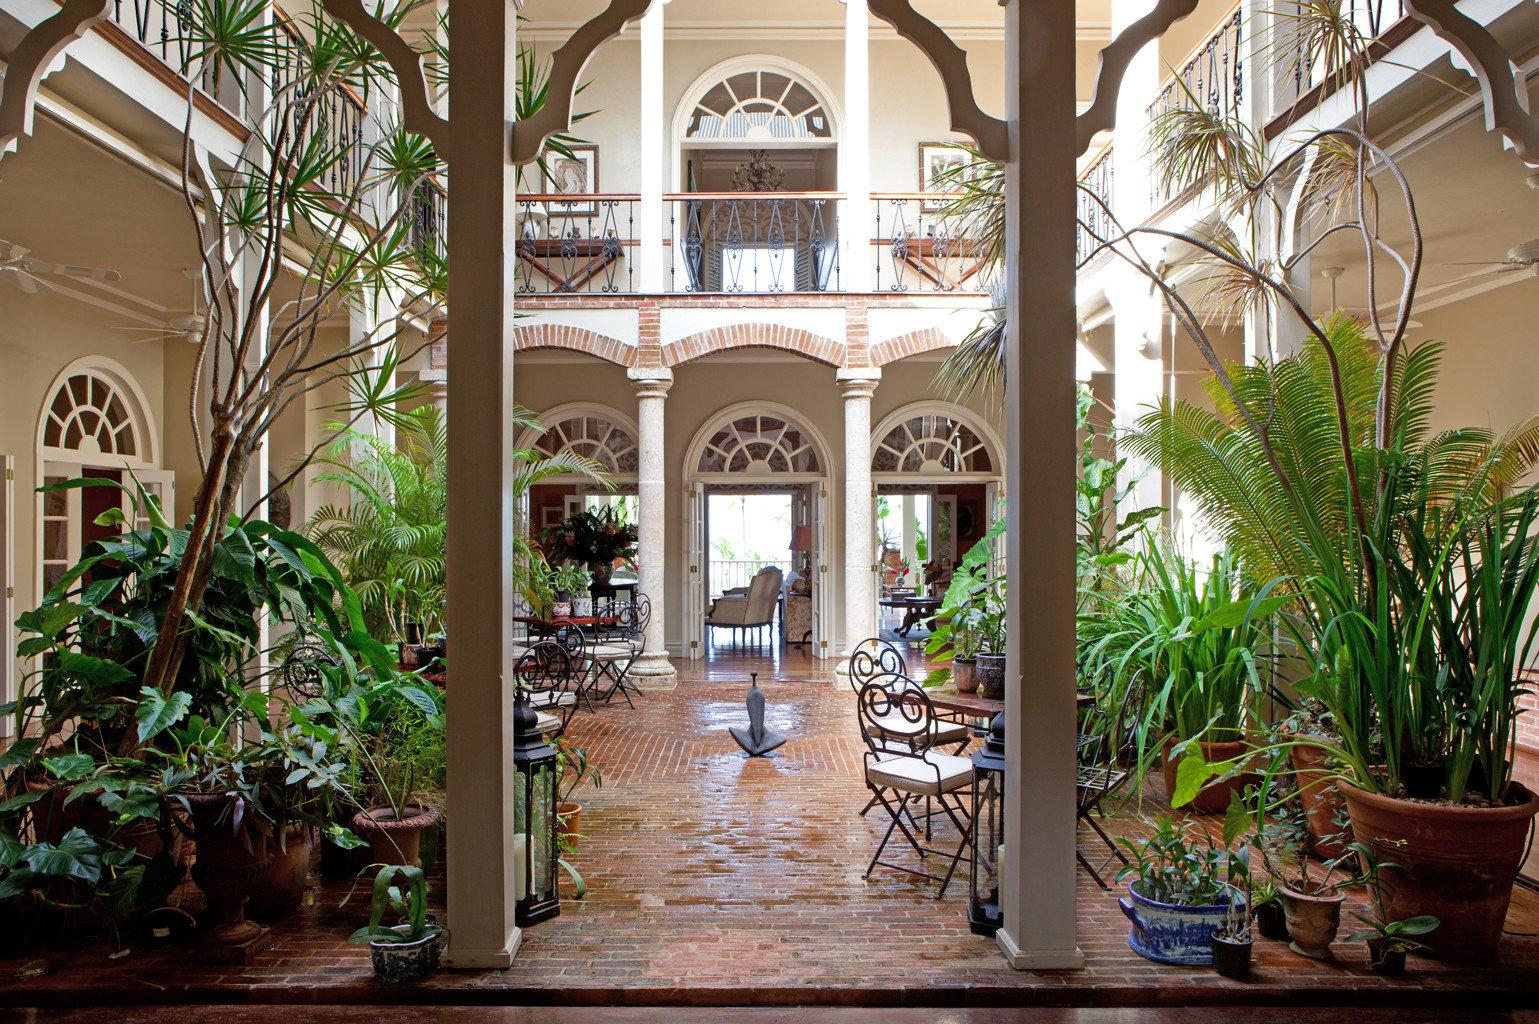 Boutique Dining Drink Eat Luxury Romance Romantic plant tree building Courtyard home Resort mansion Garden hacienda